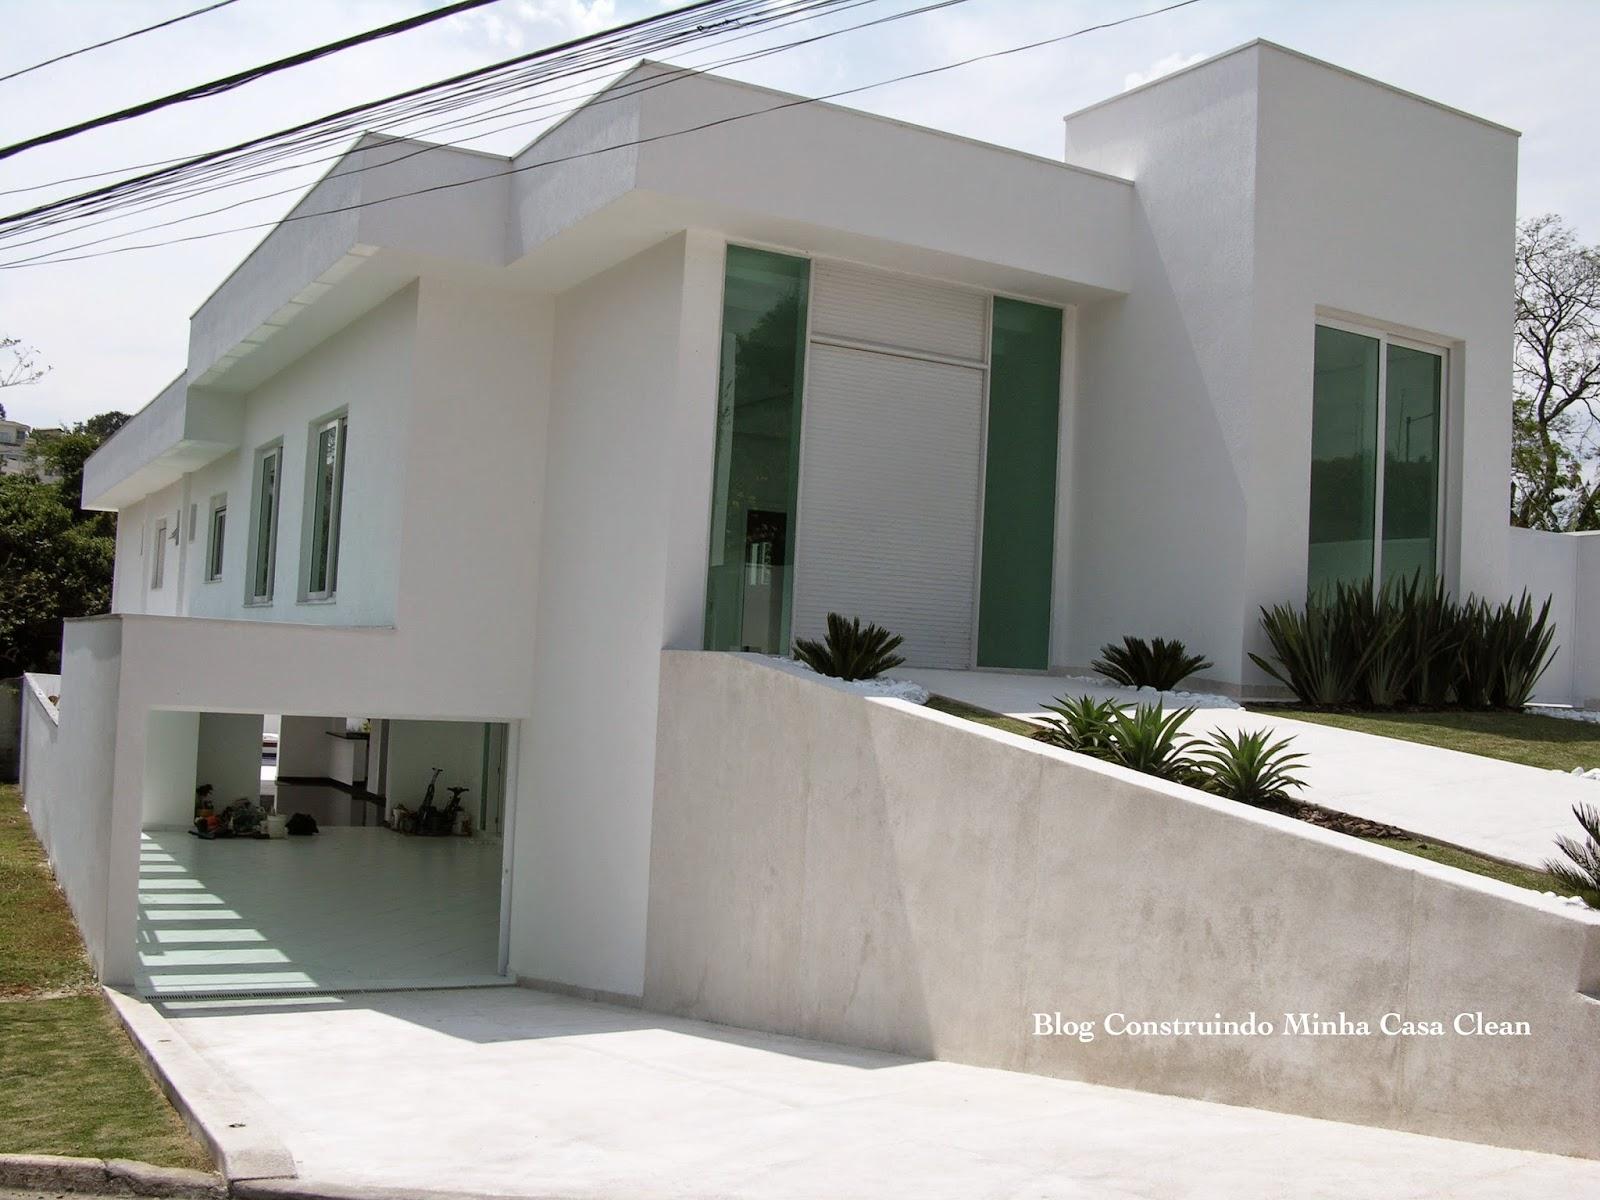 Construindo minha casa clean fachadas de casas em terrenos em declive como construir - Casa con terreno ...